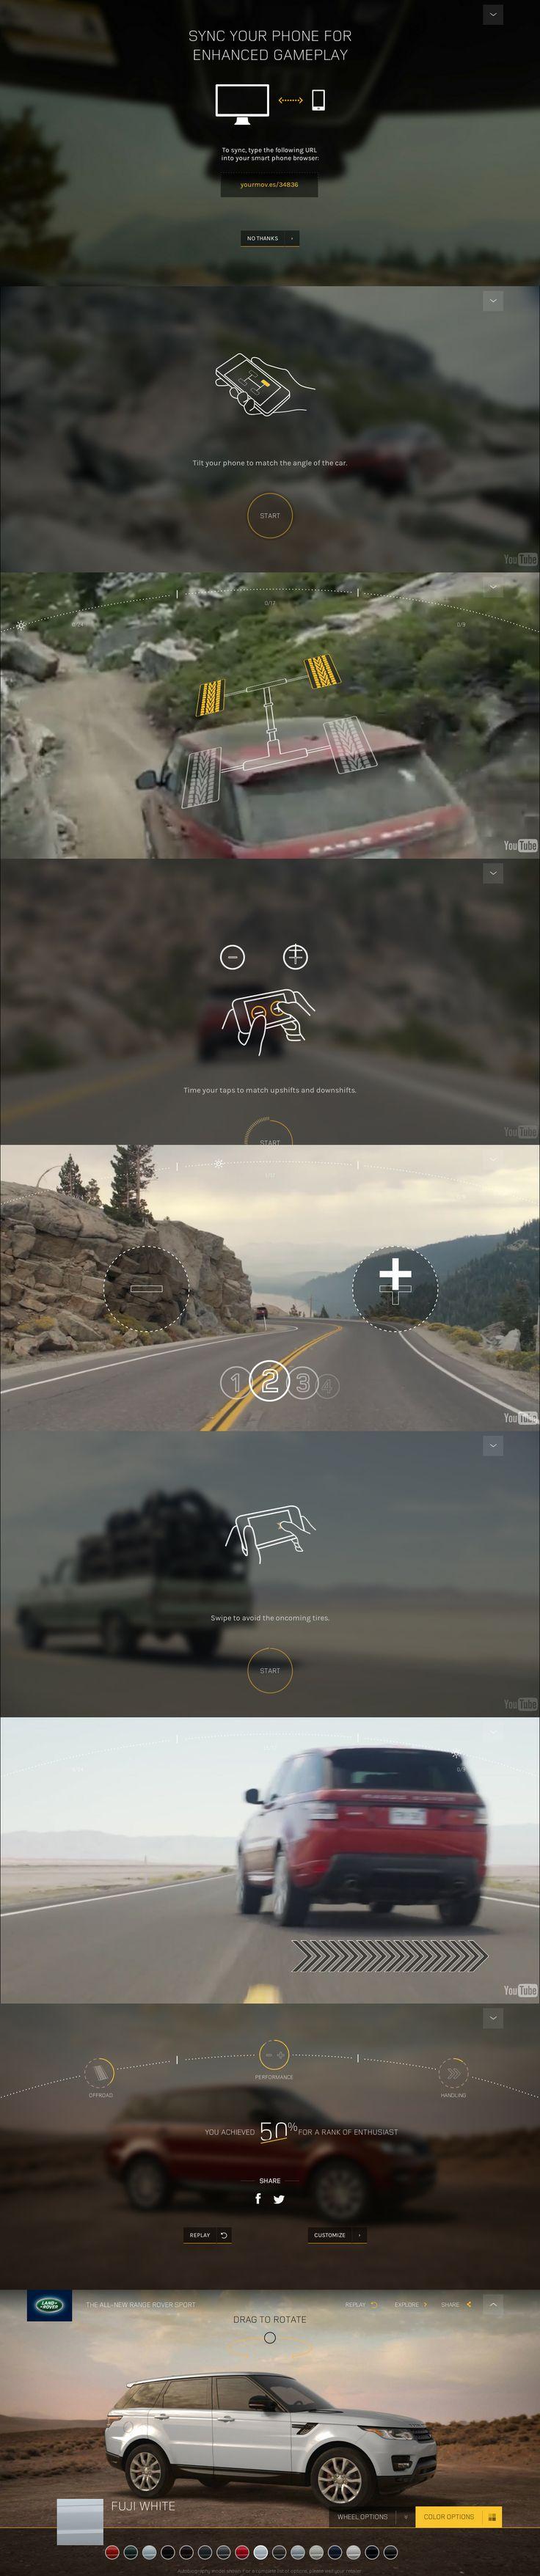 Cool Automotive Web Design on the Internet. Range Rover. #automotive #webdesign @ http://www.pinterest.com/alfredchong/automotive-web-design/